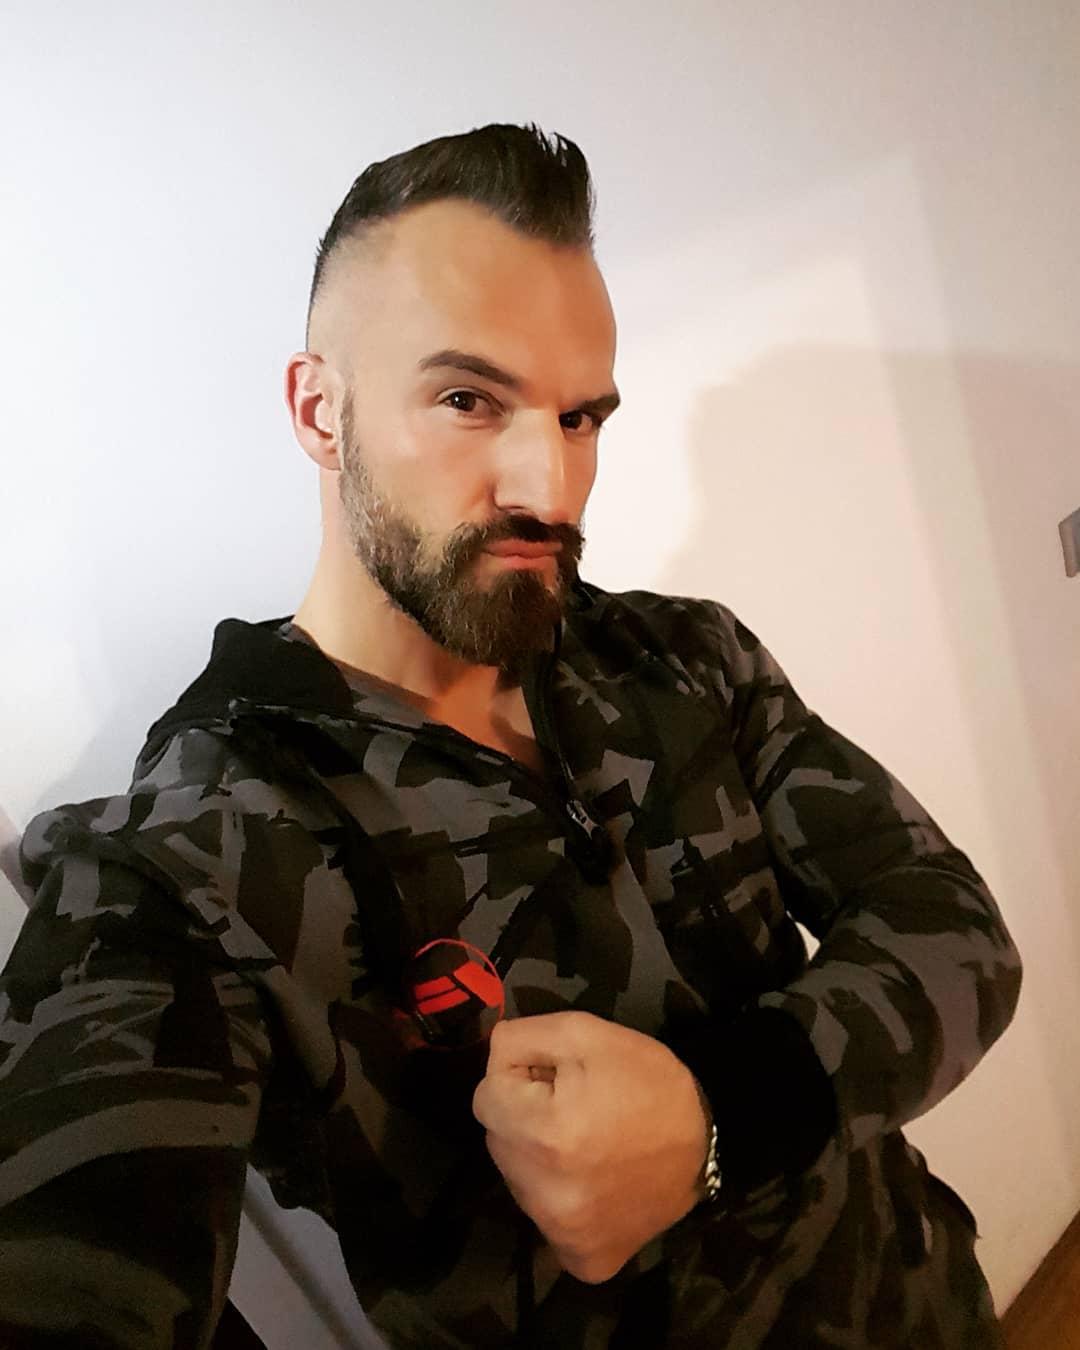 Die Woche wird hart, doch der Boss ist härter… 💪🏻 . #pusher #nopornnogain #fitness #fitfamgermany #bodybuilding #hard #gains #selfie #me #mcfit #johnreed #berlin #motivation #trainhard #workout #sport #body #pumped #german #gym #noexcuses #nopainnogain #instafit #trainhard #getstrong #potd #followme #bangboss #bosshaft #pornstar